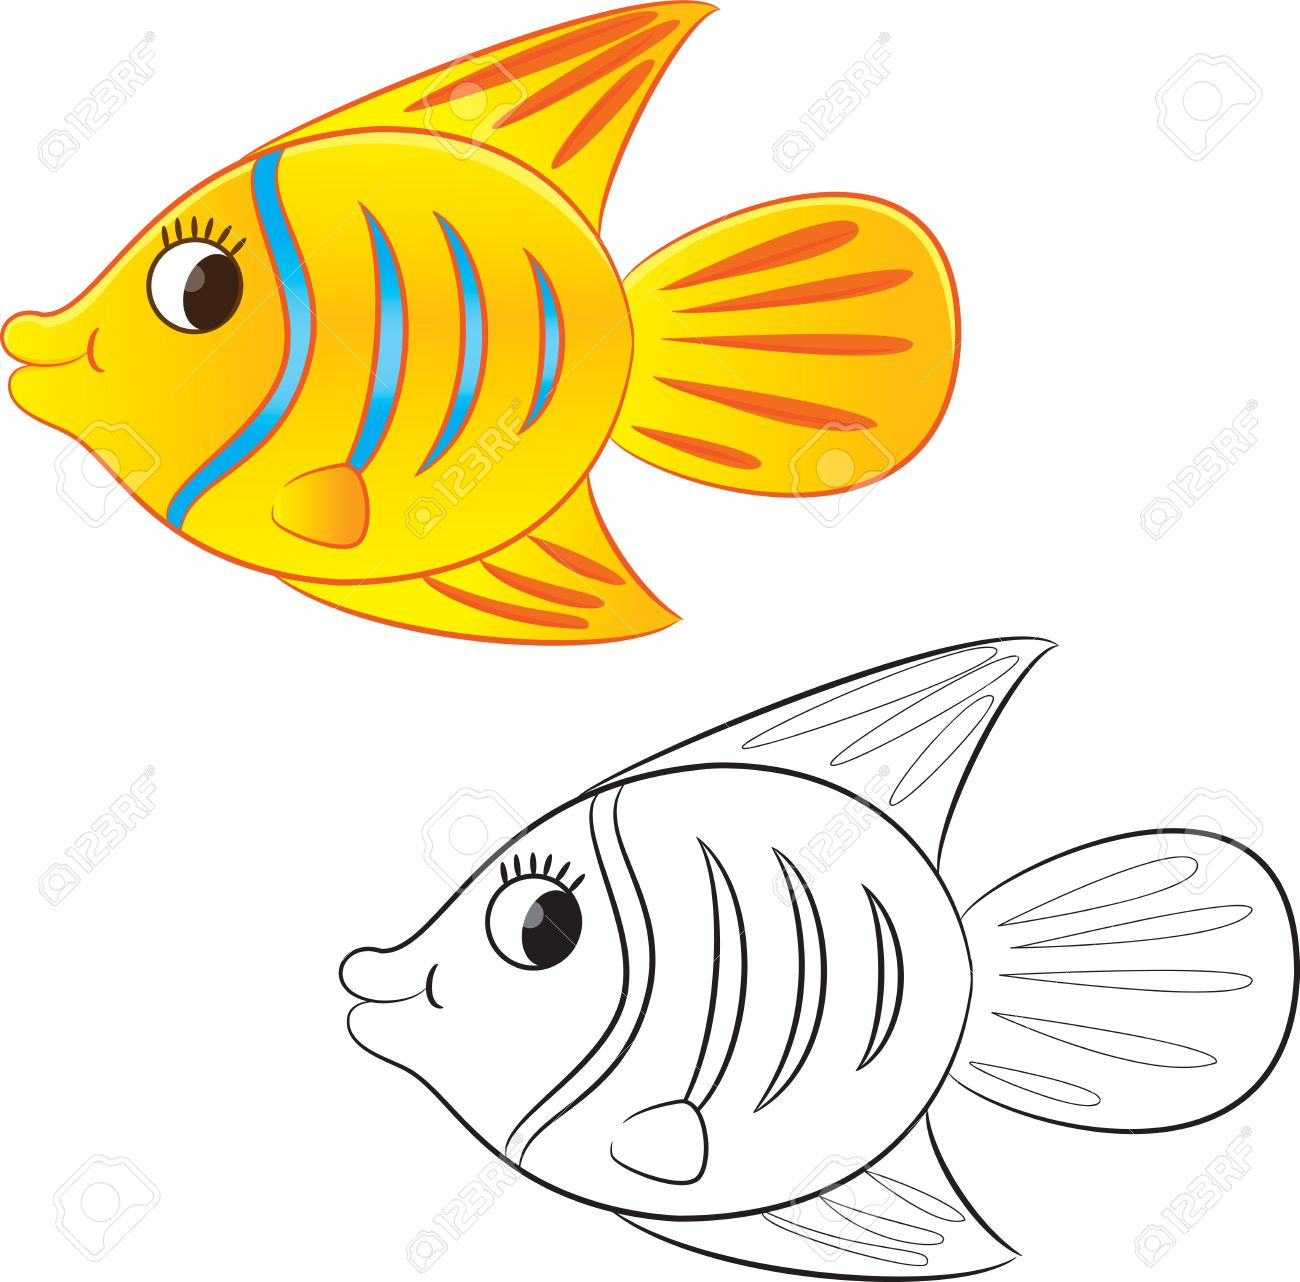 cartoon fish coloring page vector illustration royalty free